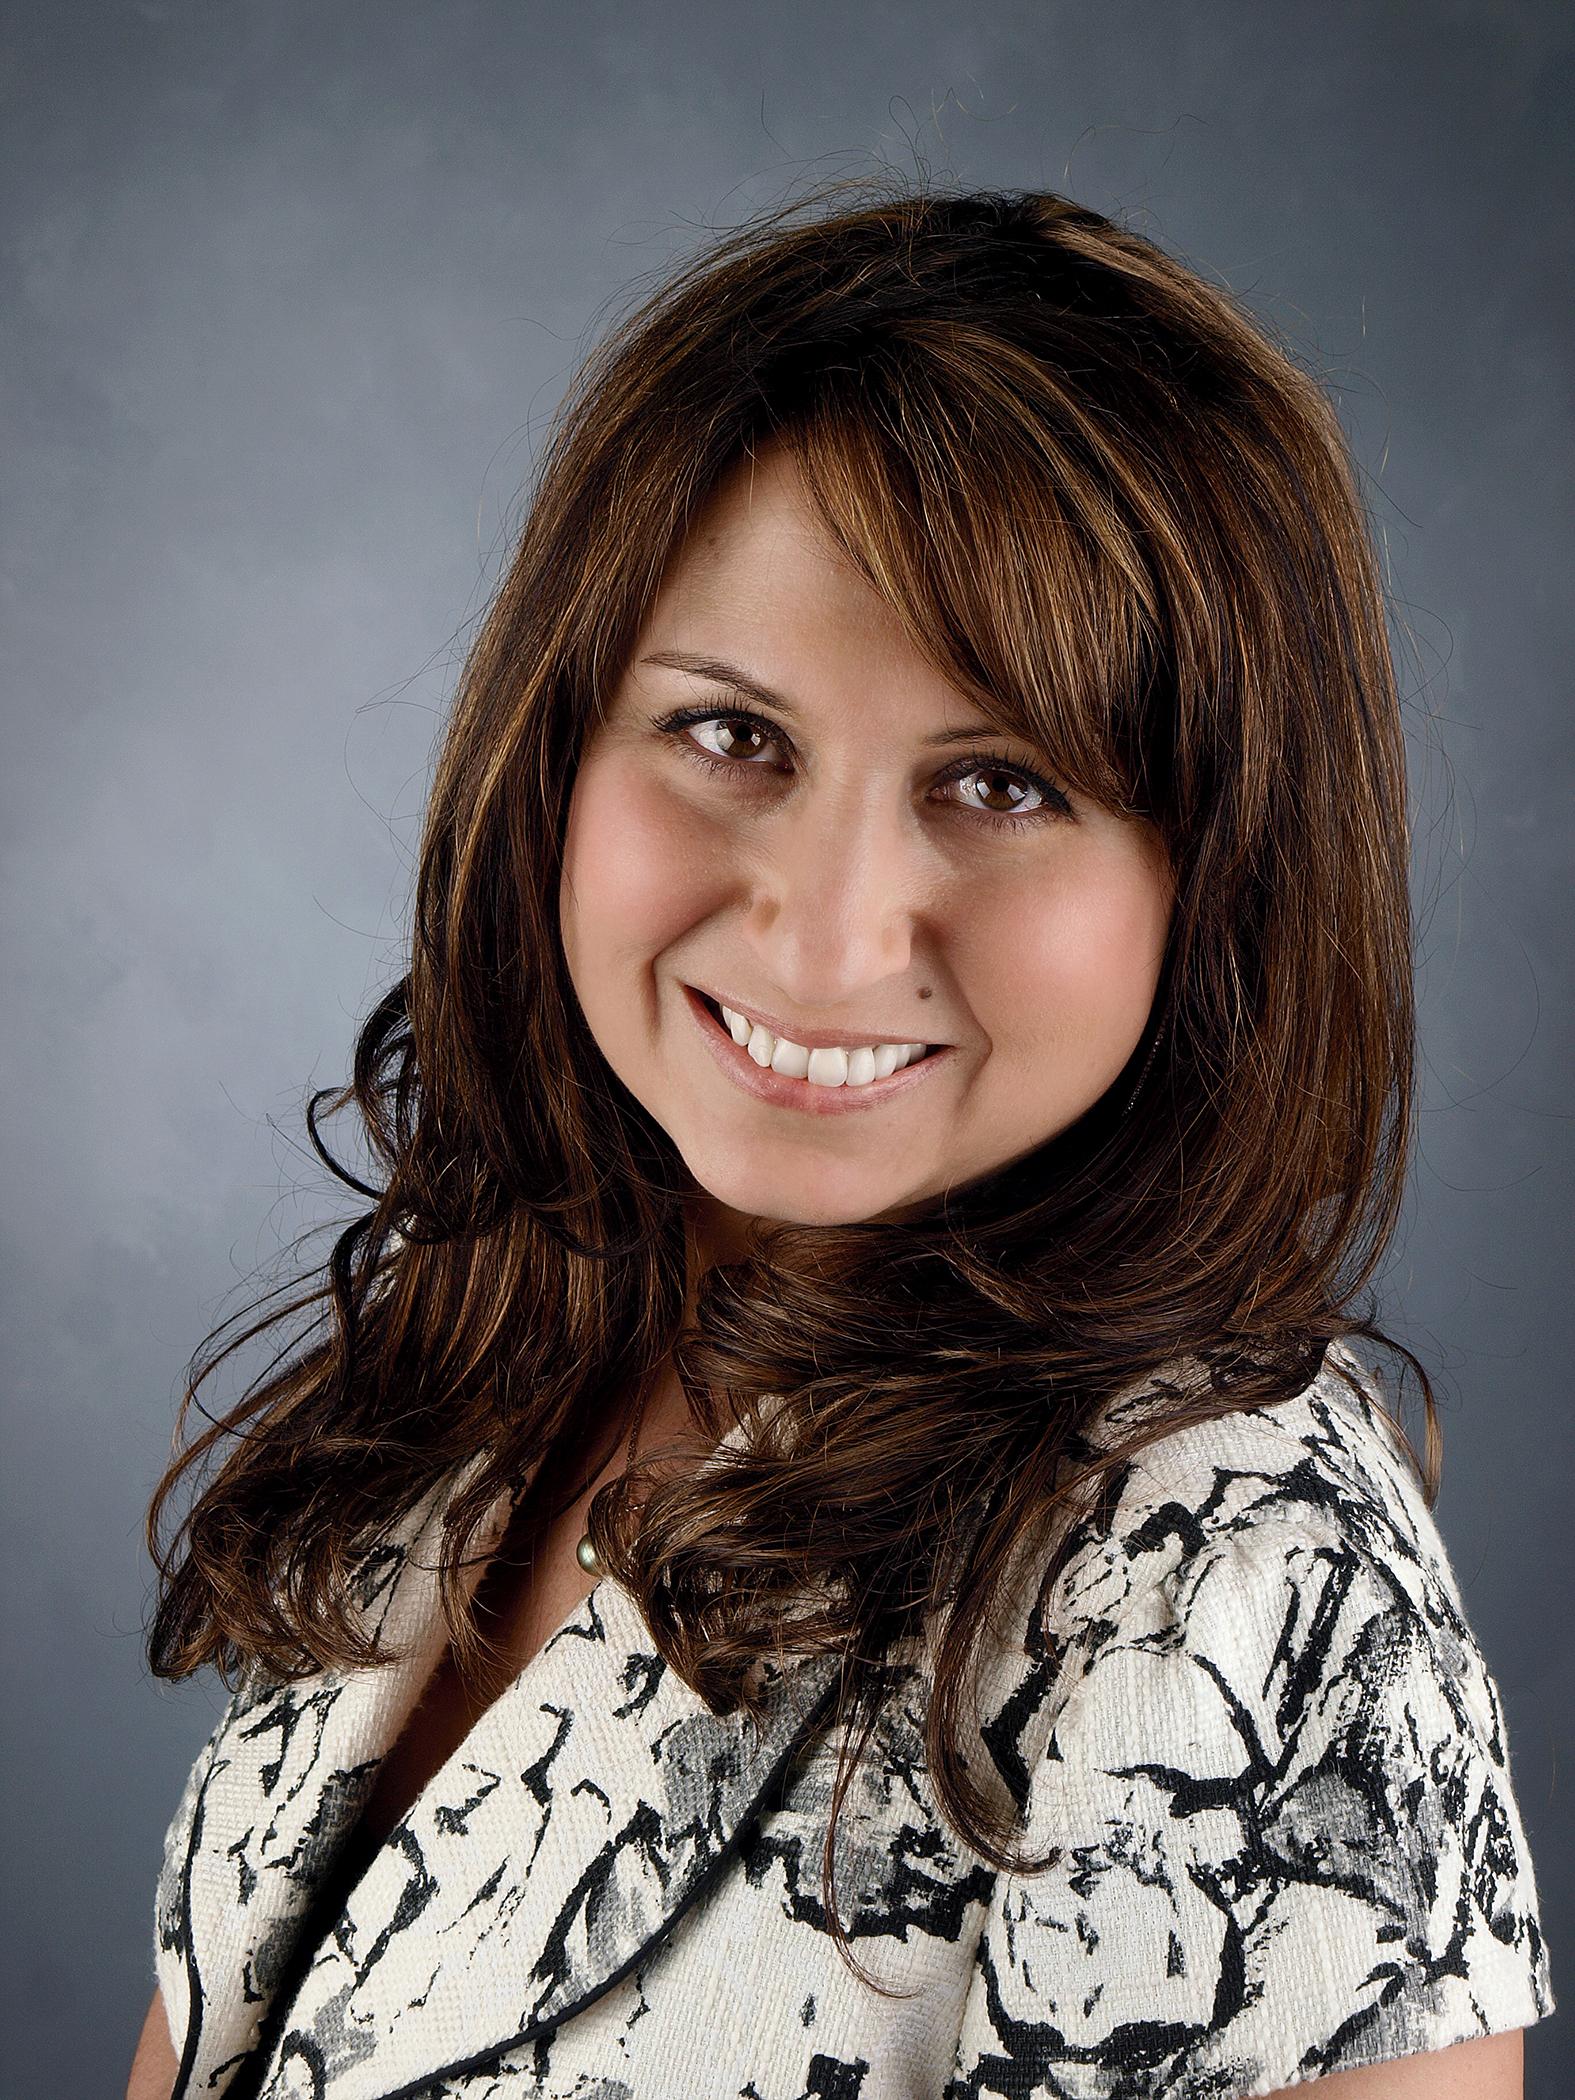 Founder of Speaking Autism Canada, Linda Mastroianni nominated for Wego Health Award